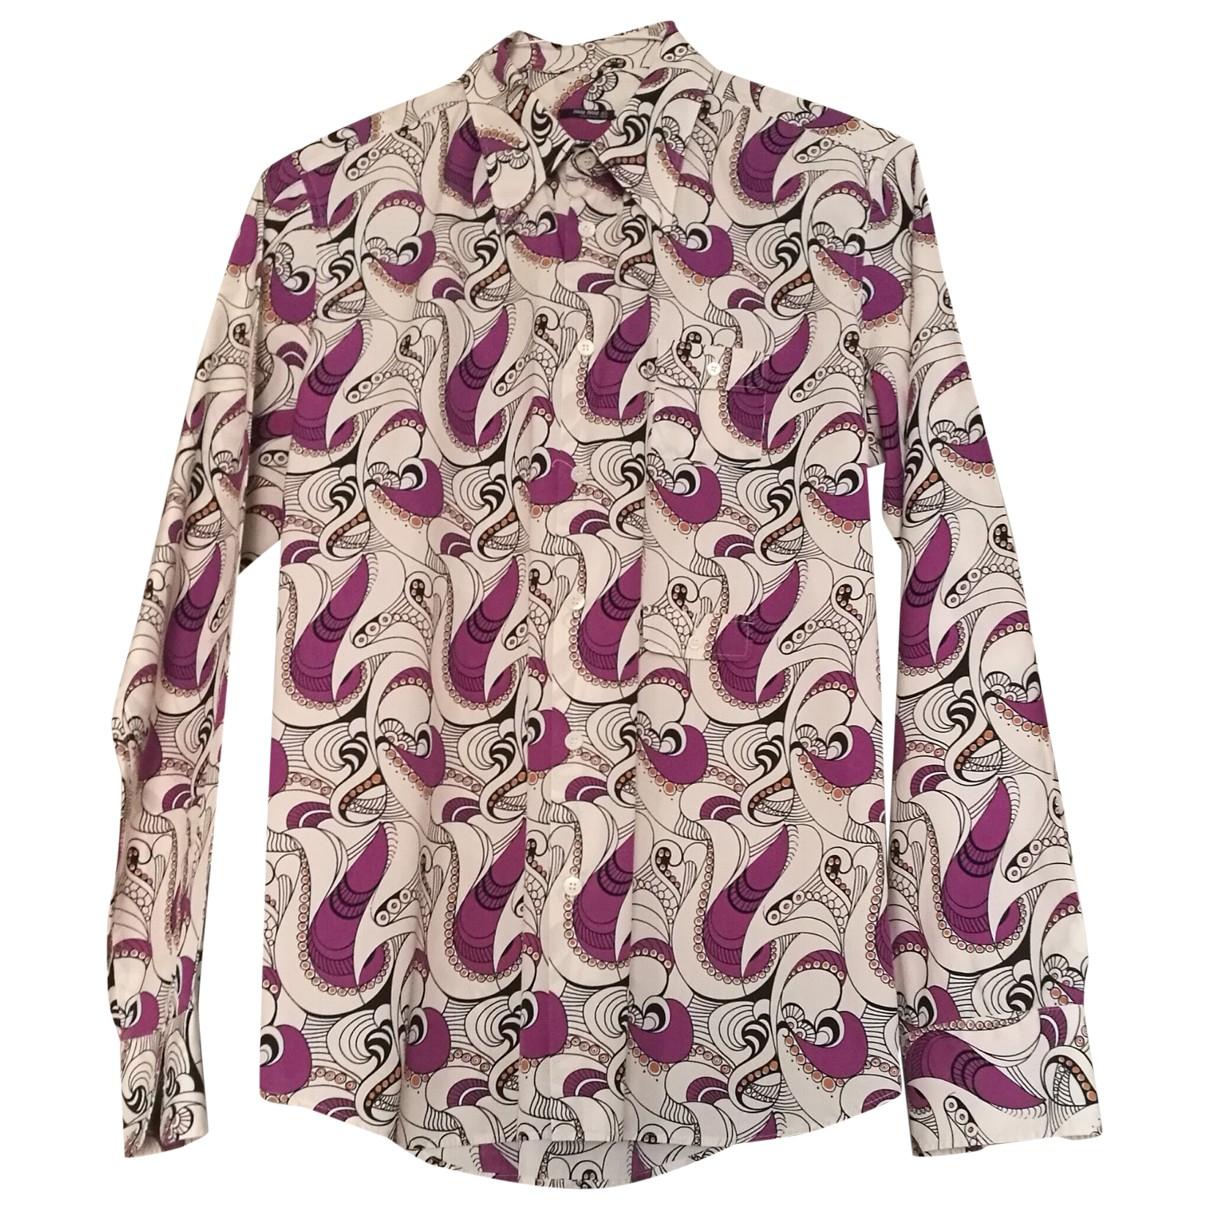 Miu Miu \N Multicolour Cotton Shirts for Men L International